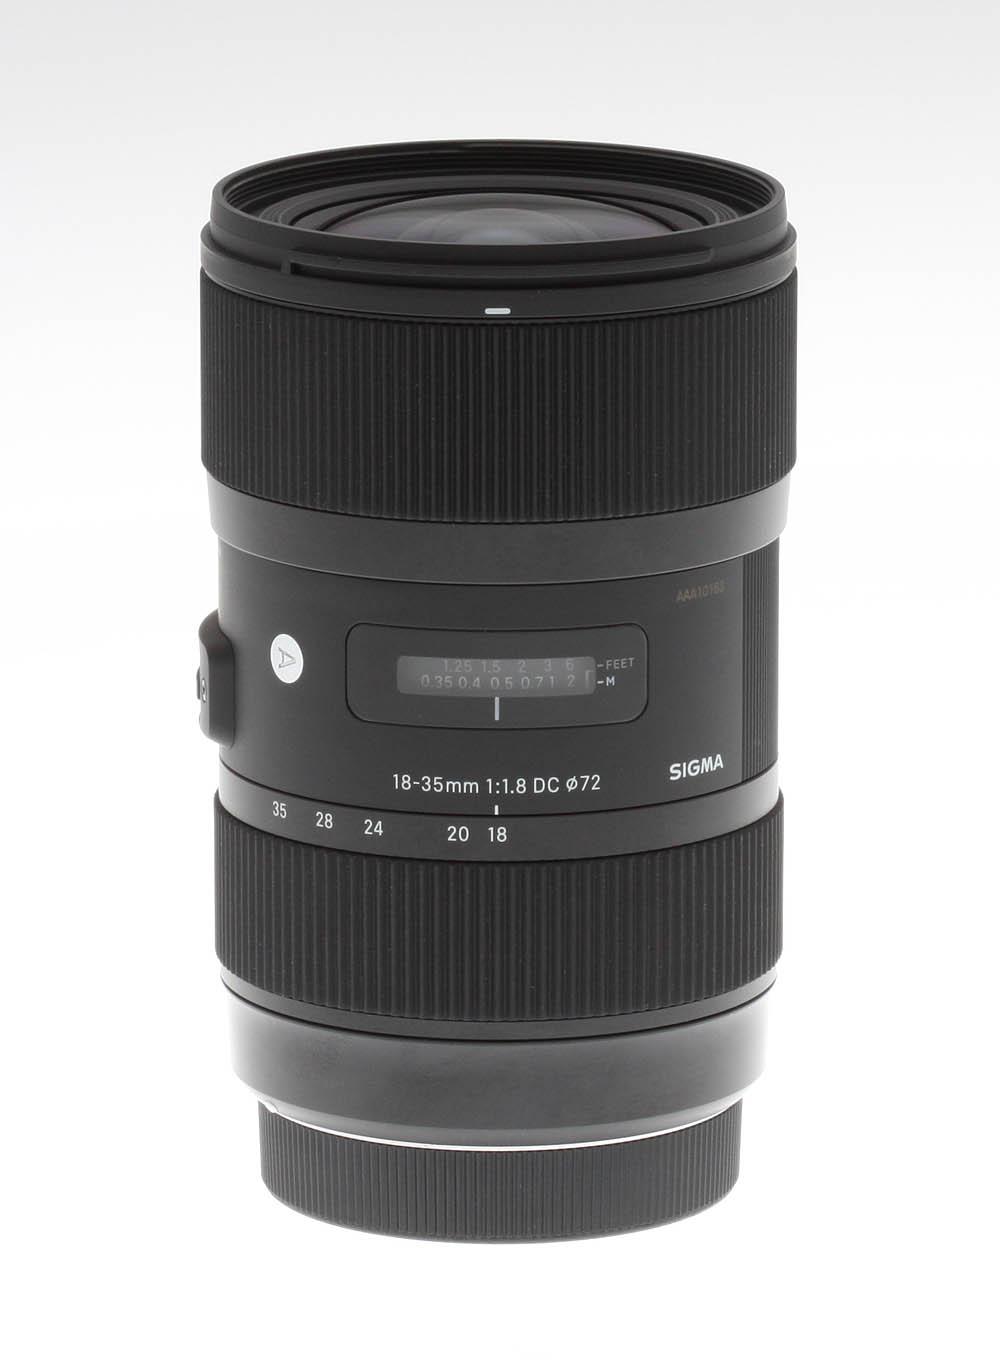 Sigma 18-35mm f/1.8 DC HSM Art Review